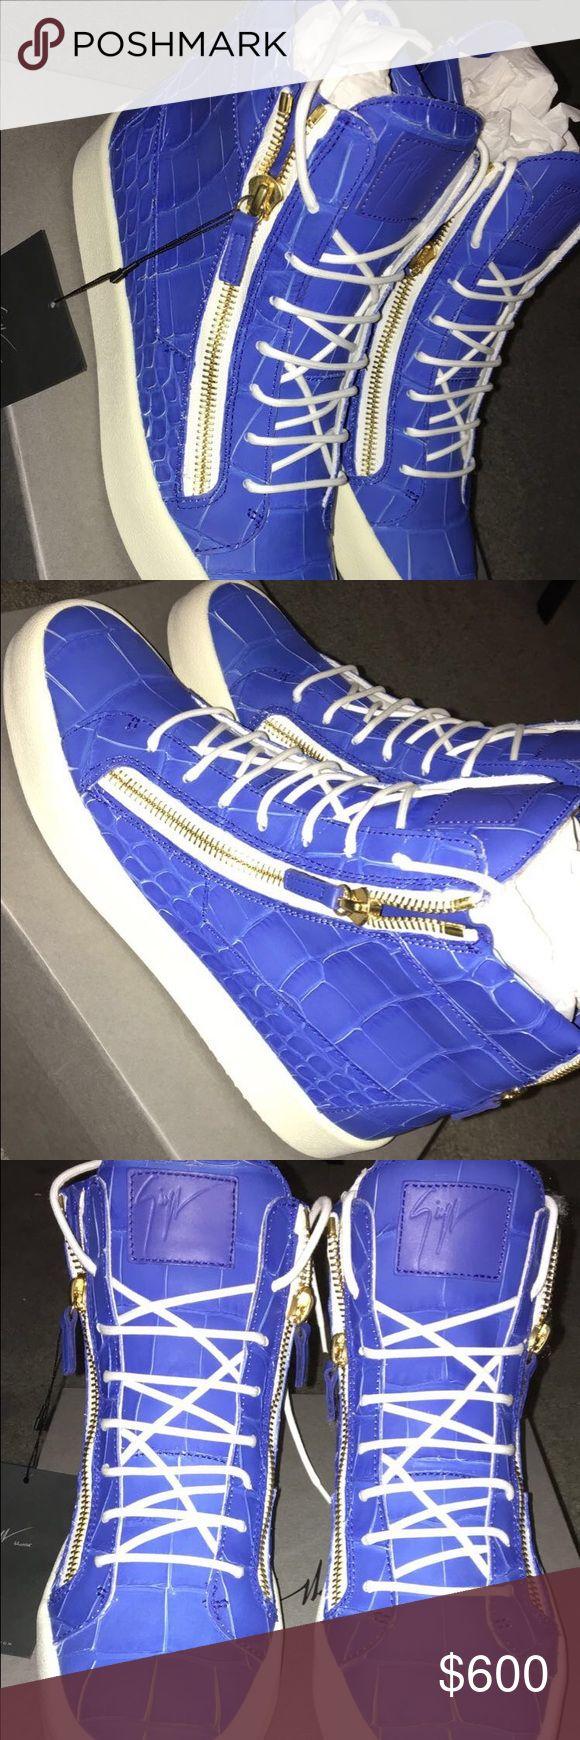 giuseppe zanotti Brand new never worn men shoes Giuseppe Zanotti Shoes Sneakers